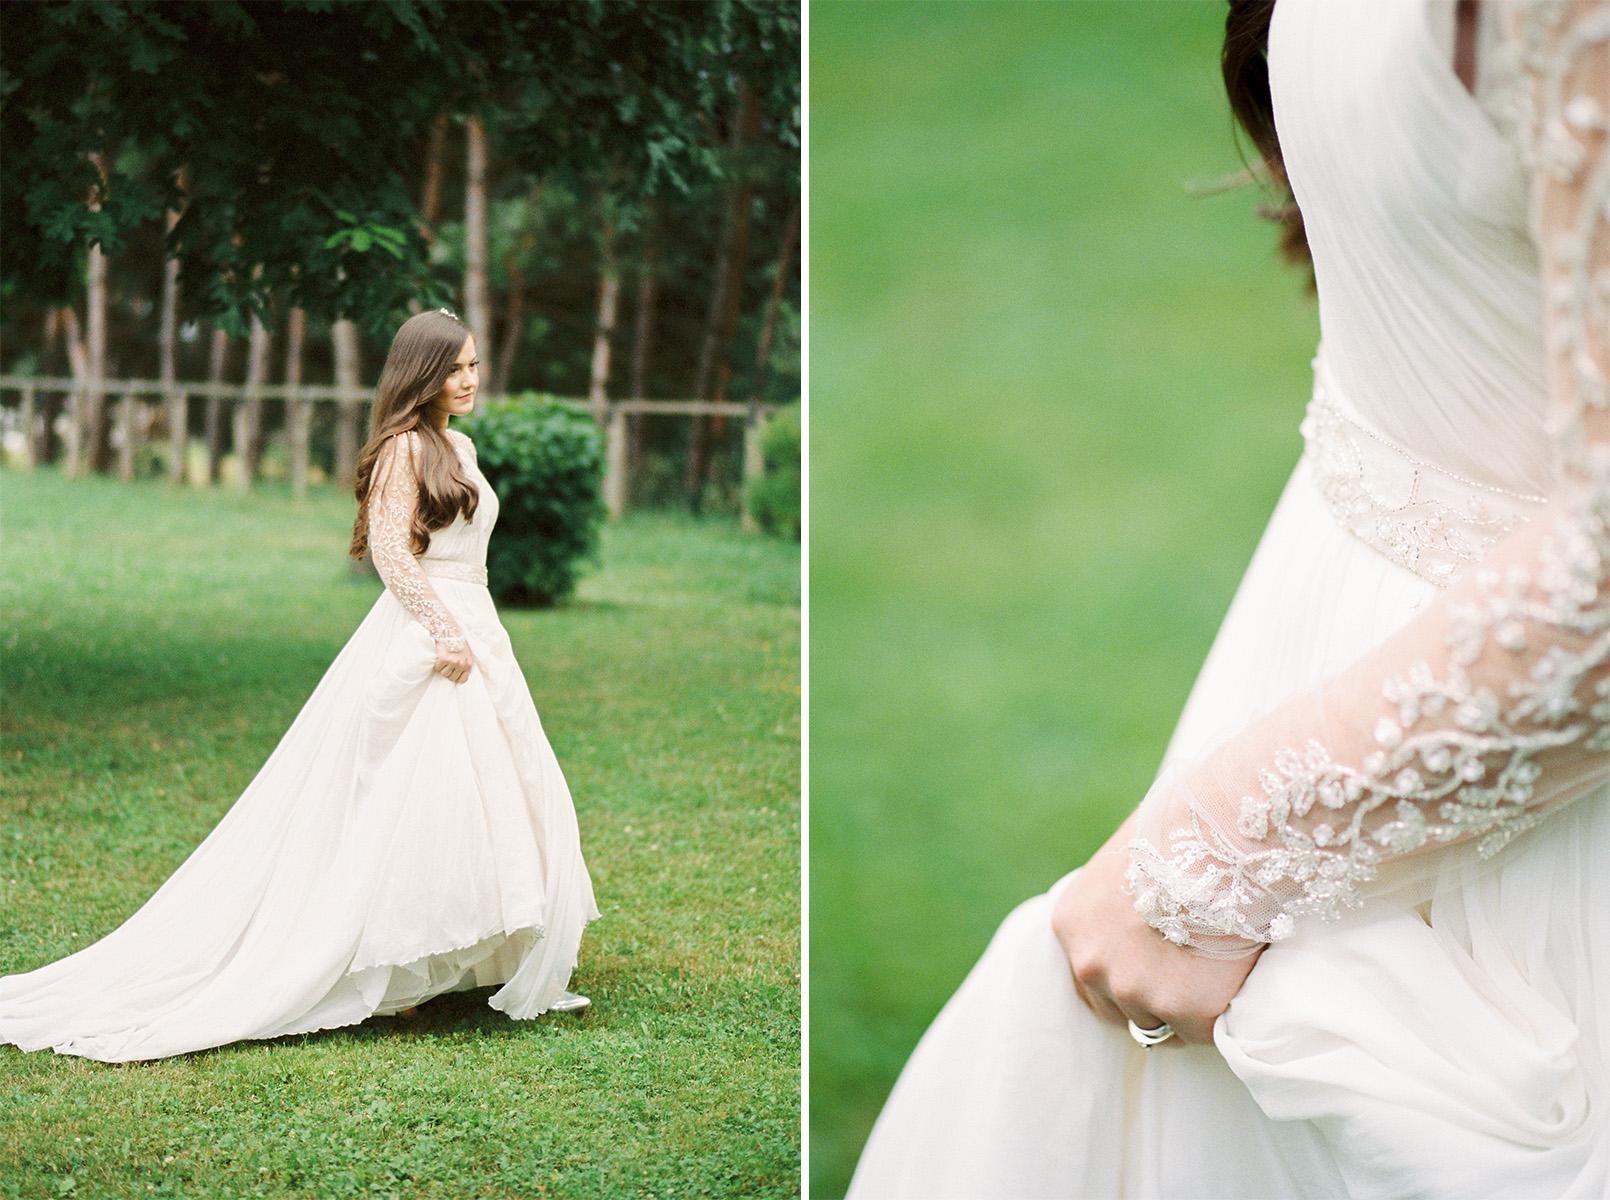 Beloved-Istvan-Erika-kreativ-menyasszonyi ruha.jpg